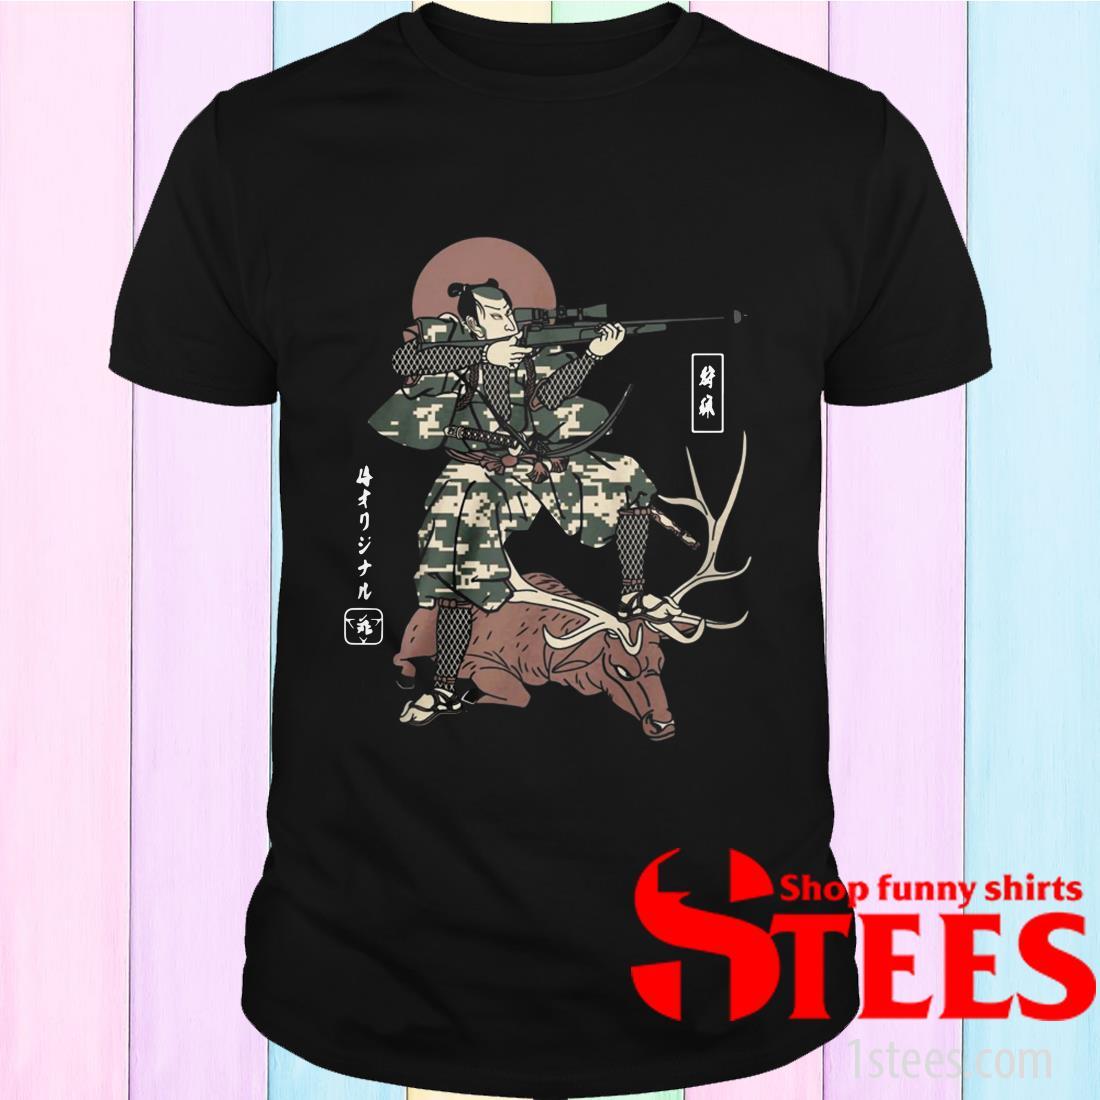 Samurai Hunting Shirt